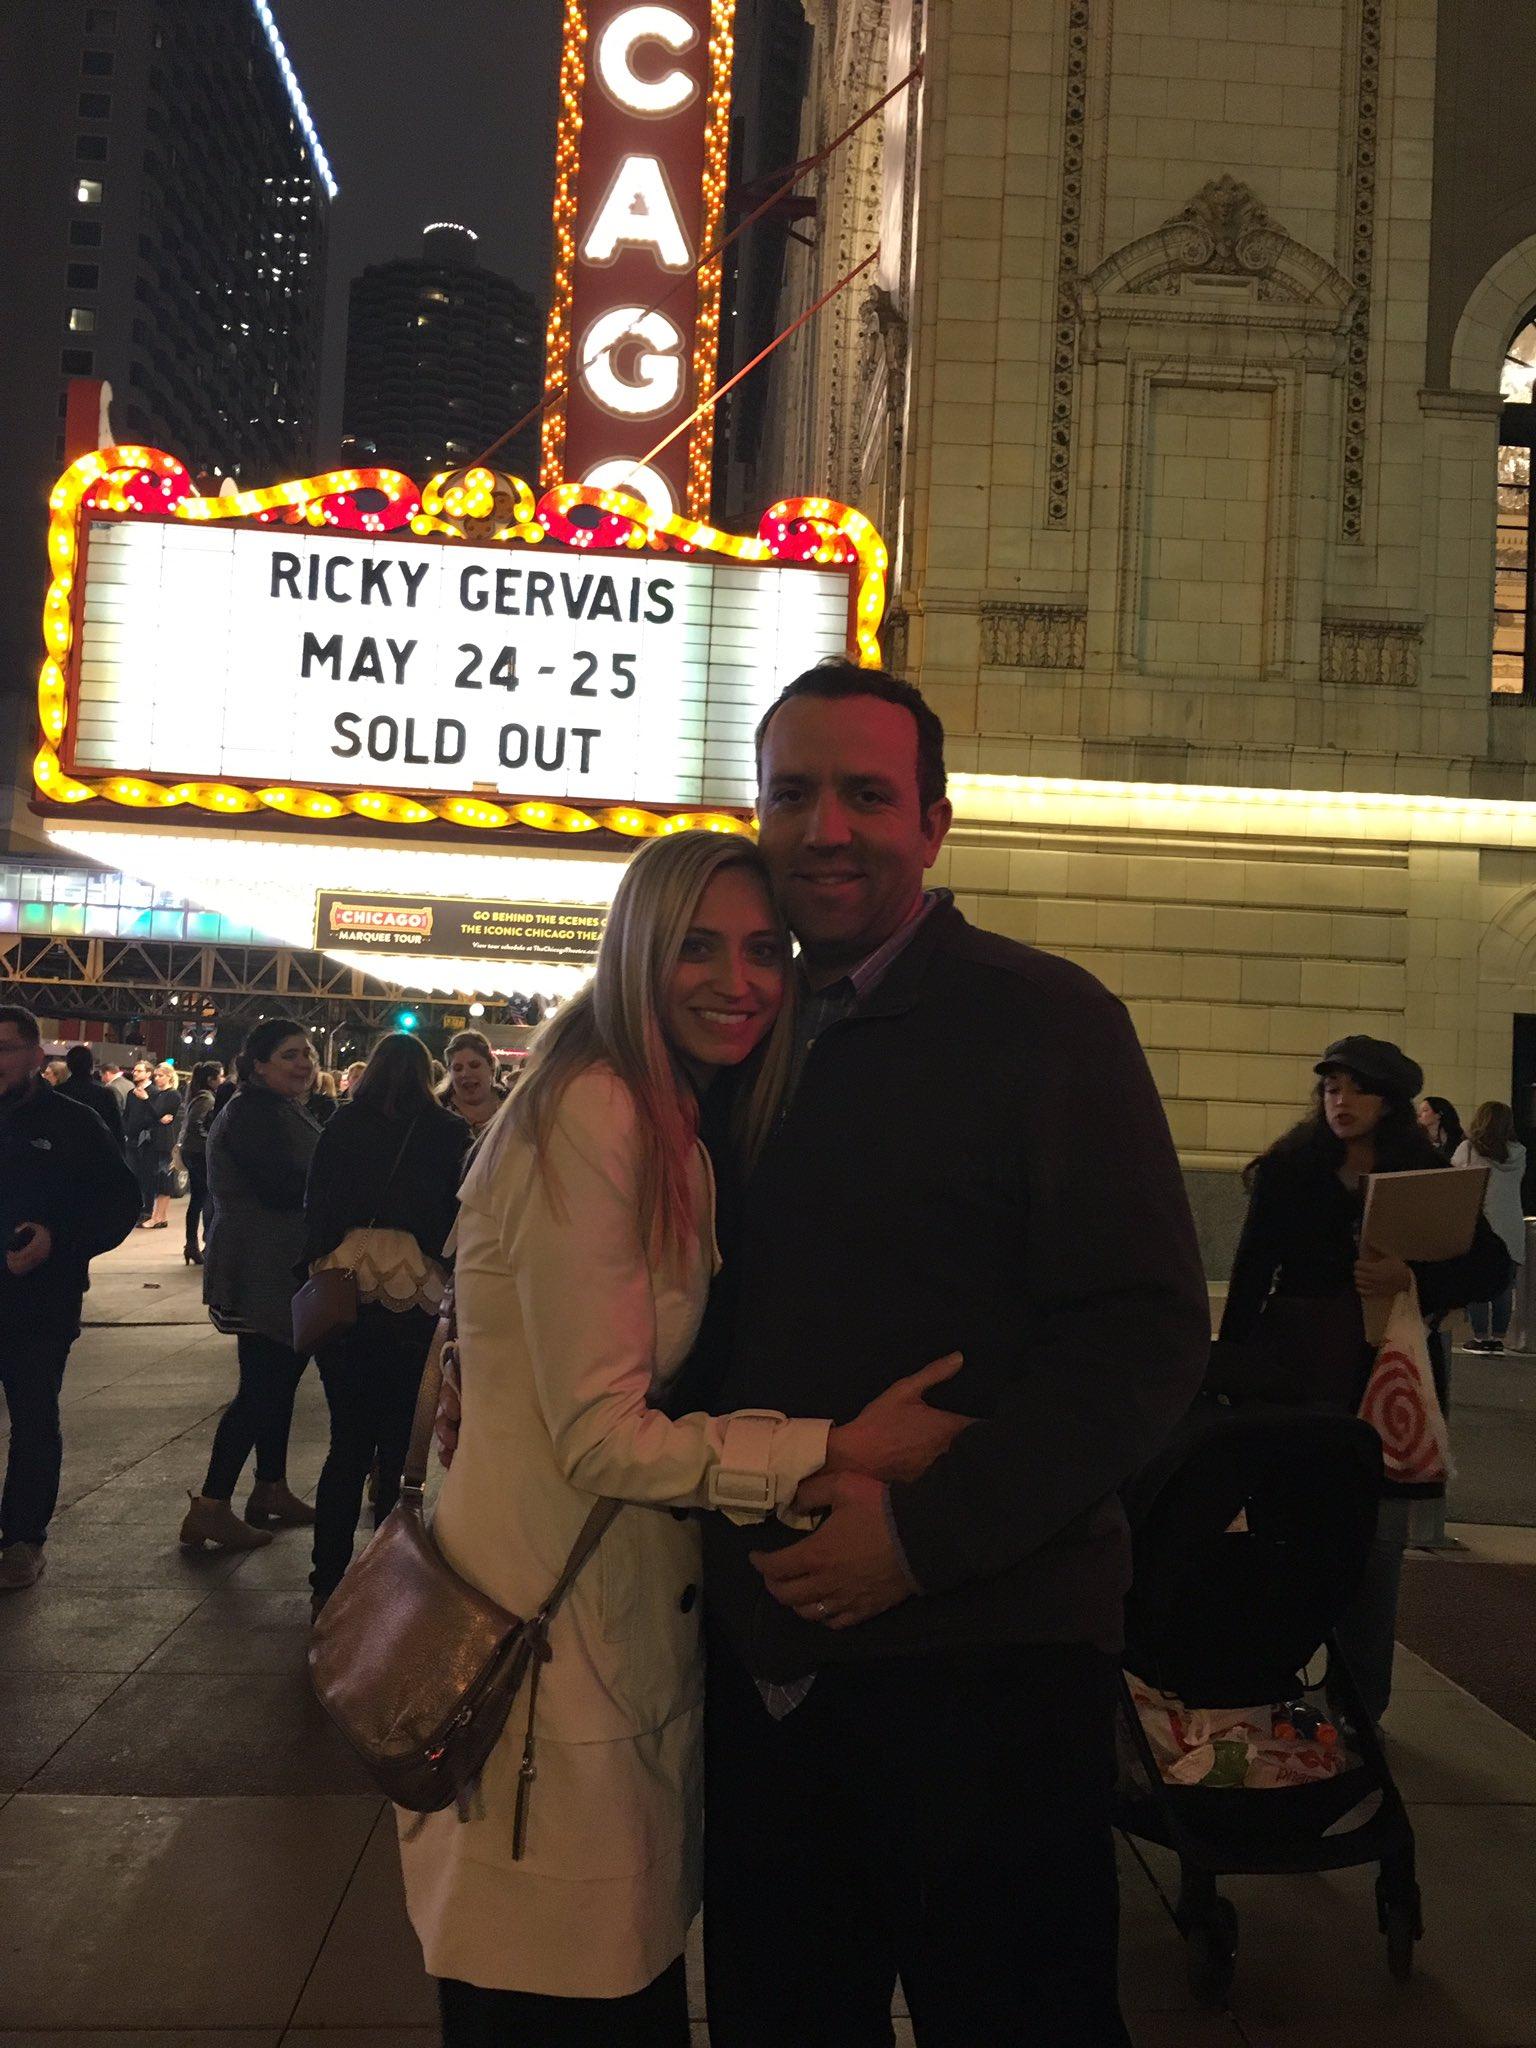 RT @KateW23: Amazing night!! Thanks @rickygervais!!! Amazing show!! https://t.co/p2erQztTaP